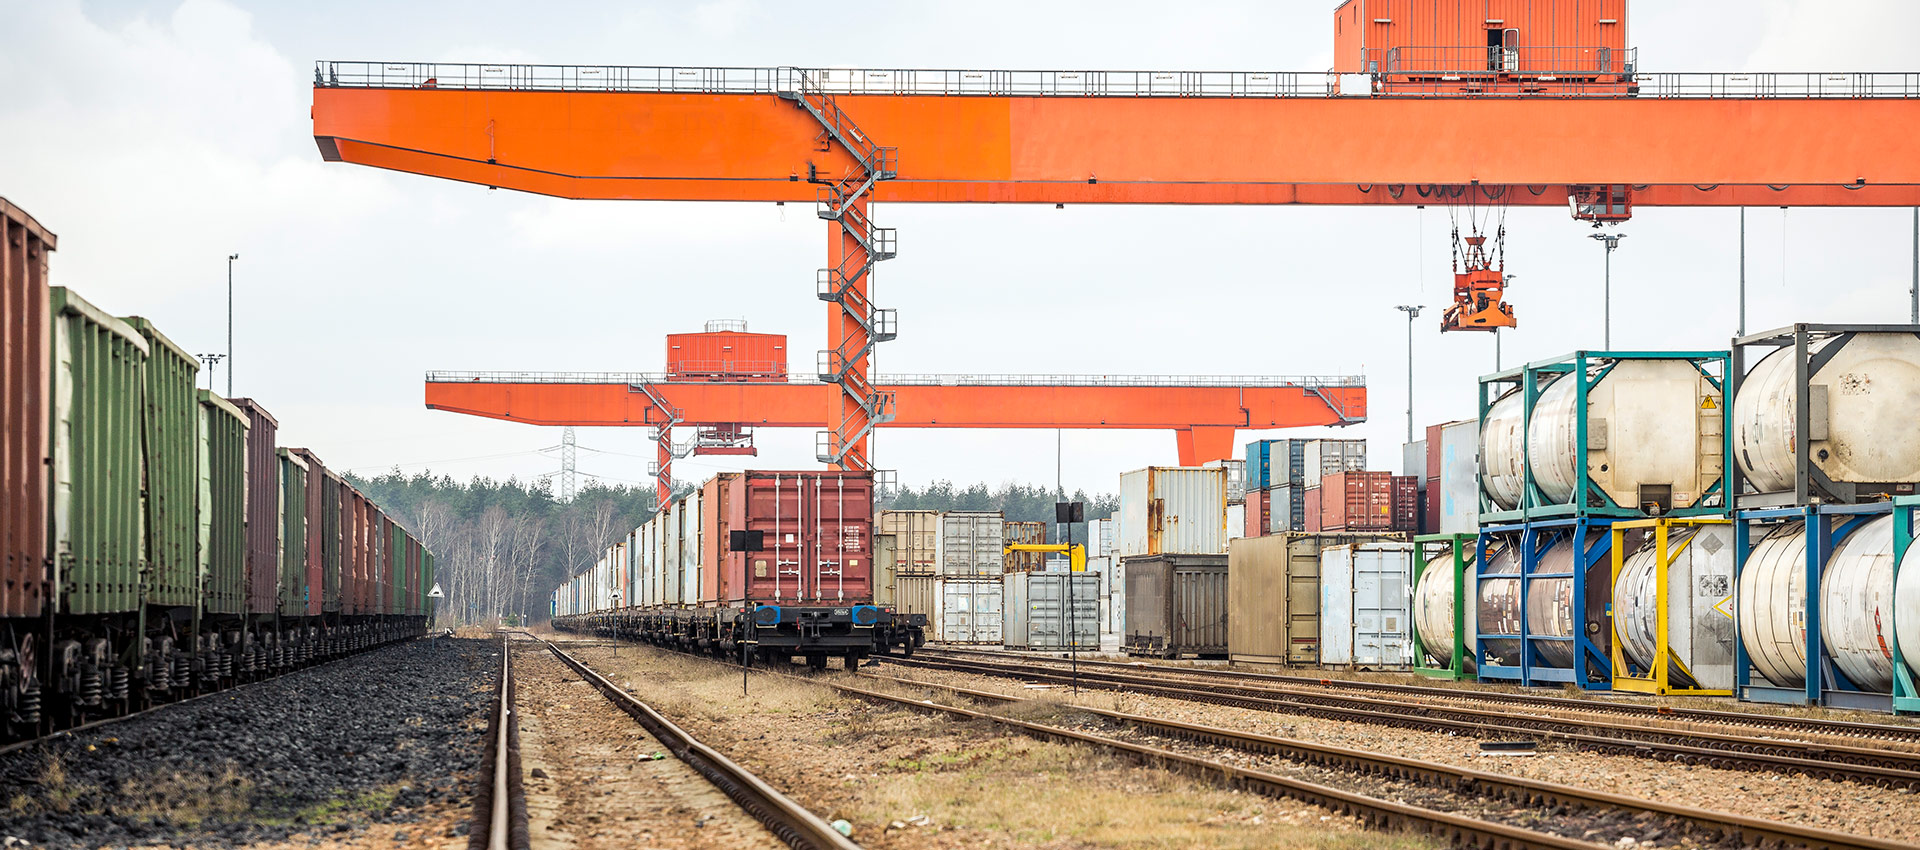 Shipment on train